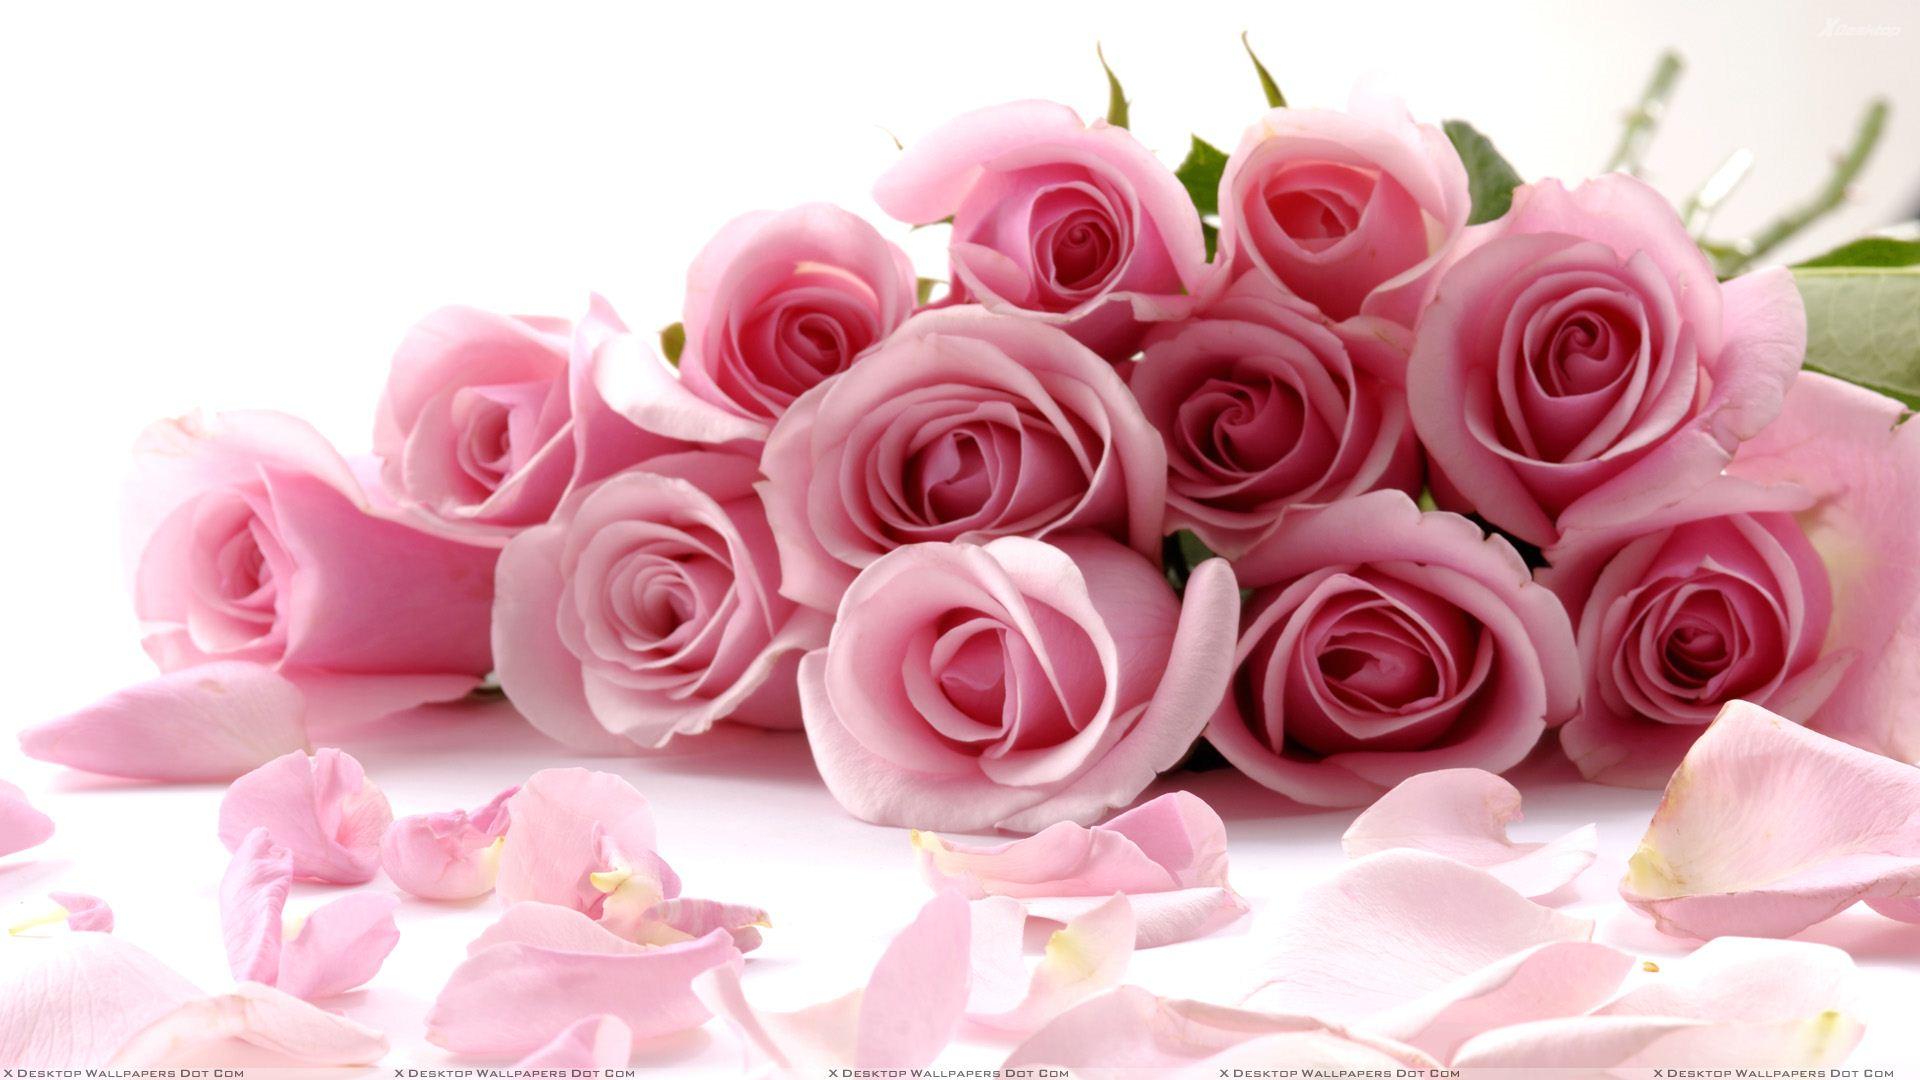 Etiquette Tipregarding Flowers Women With Gifts International